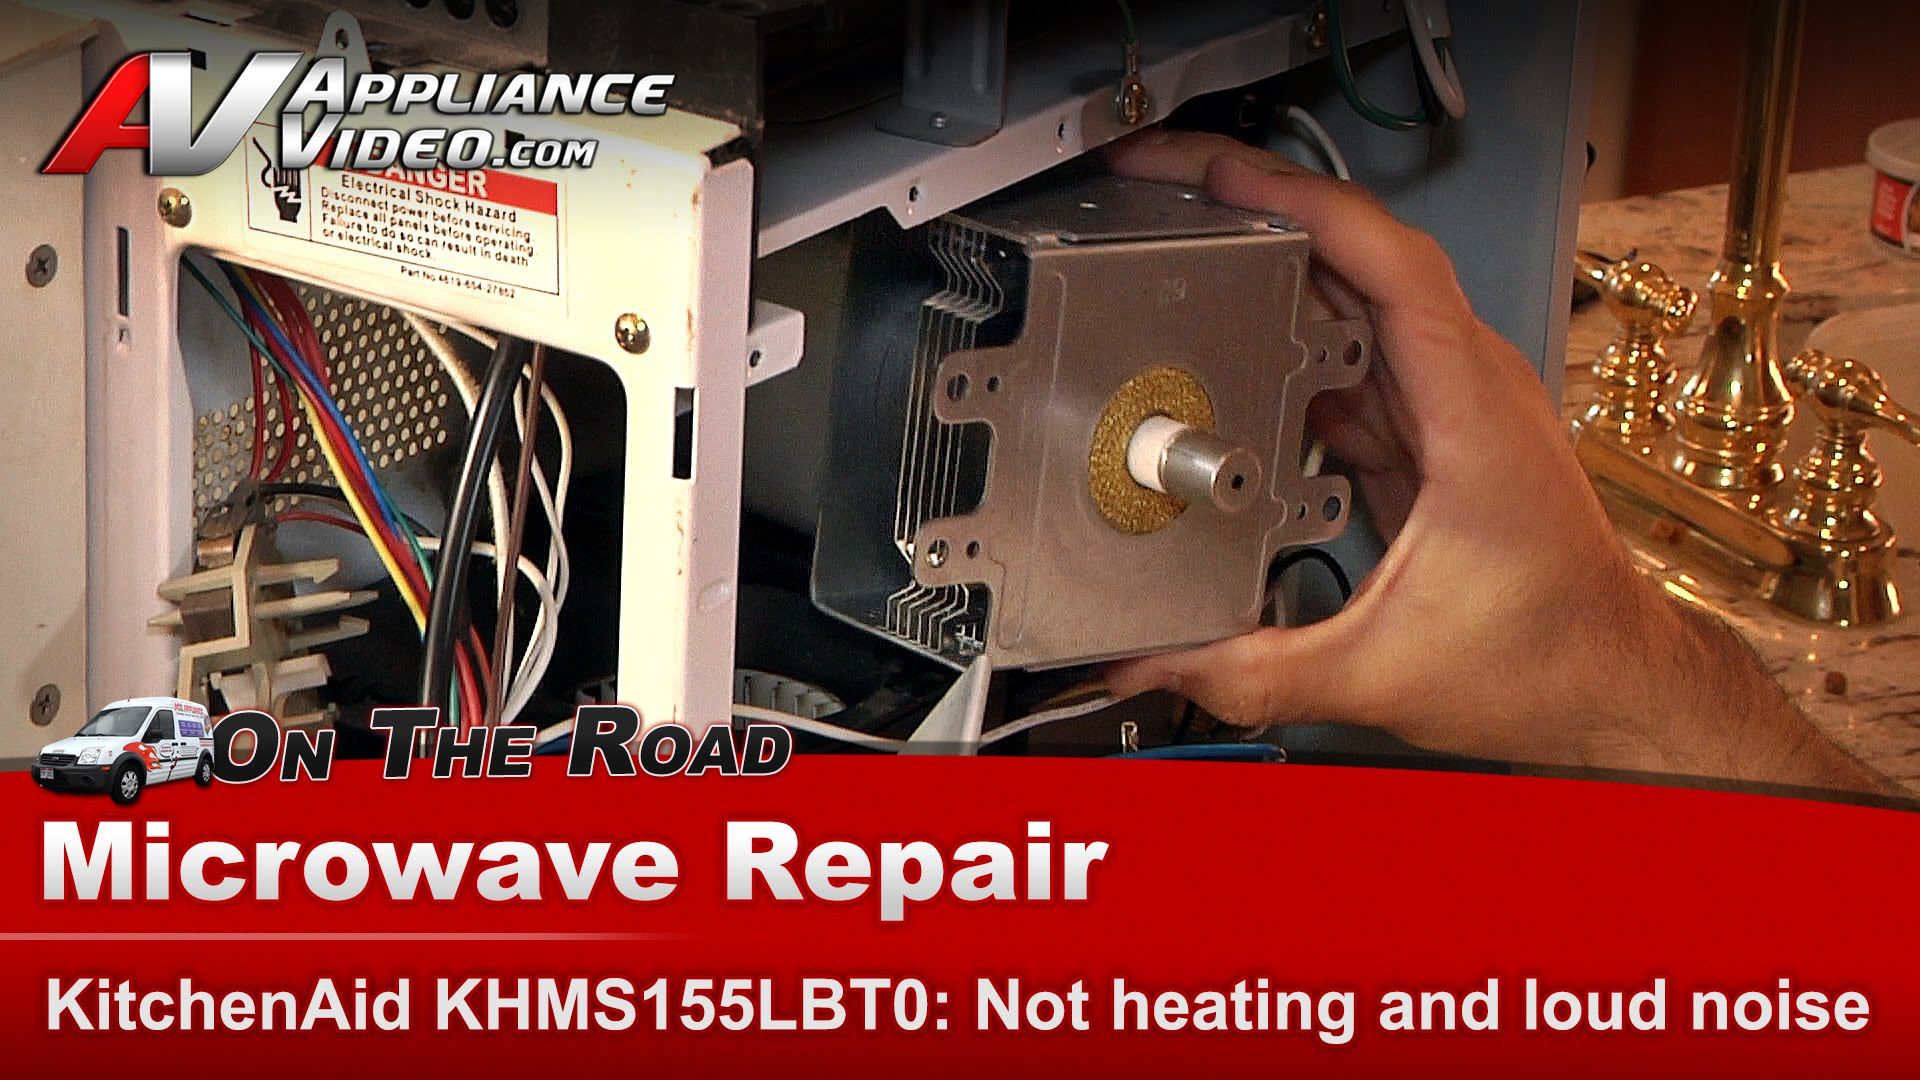 Viking Refrigerator Wiring Diagram Kitchenaid Khms155lbt0 Microwave Diagnostic Repair Will